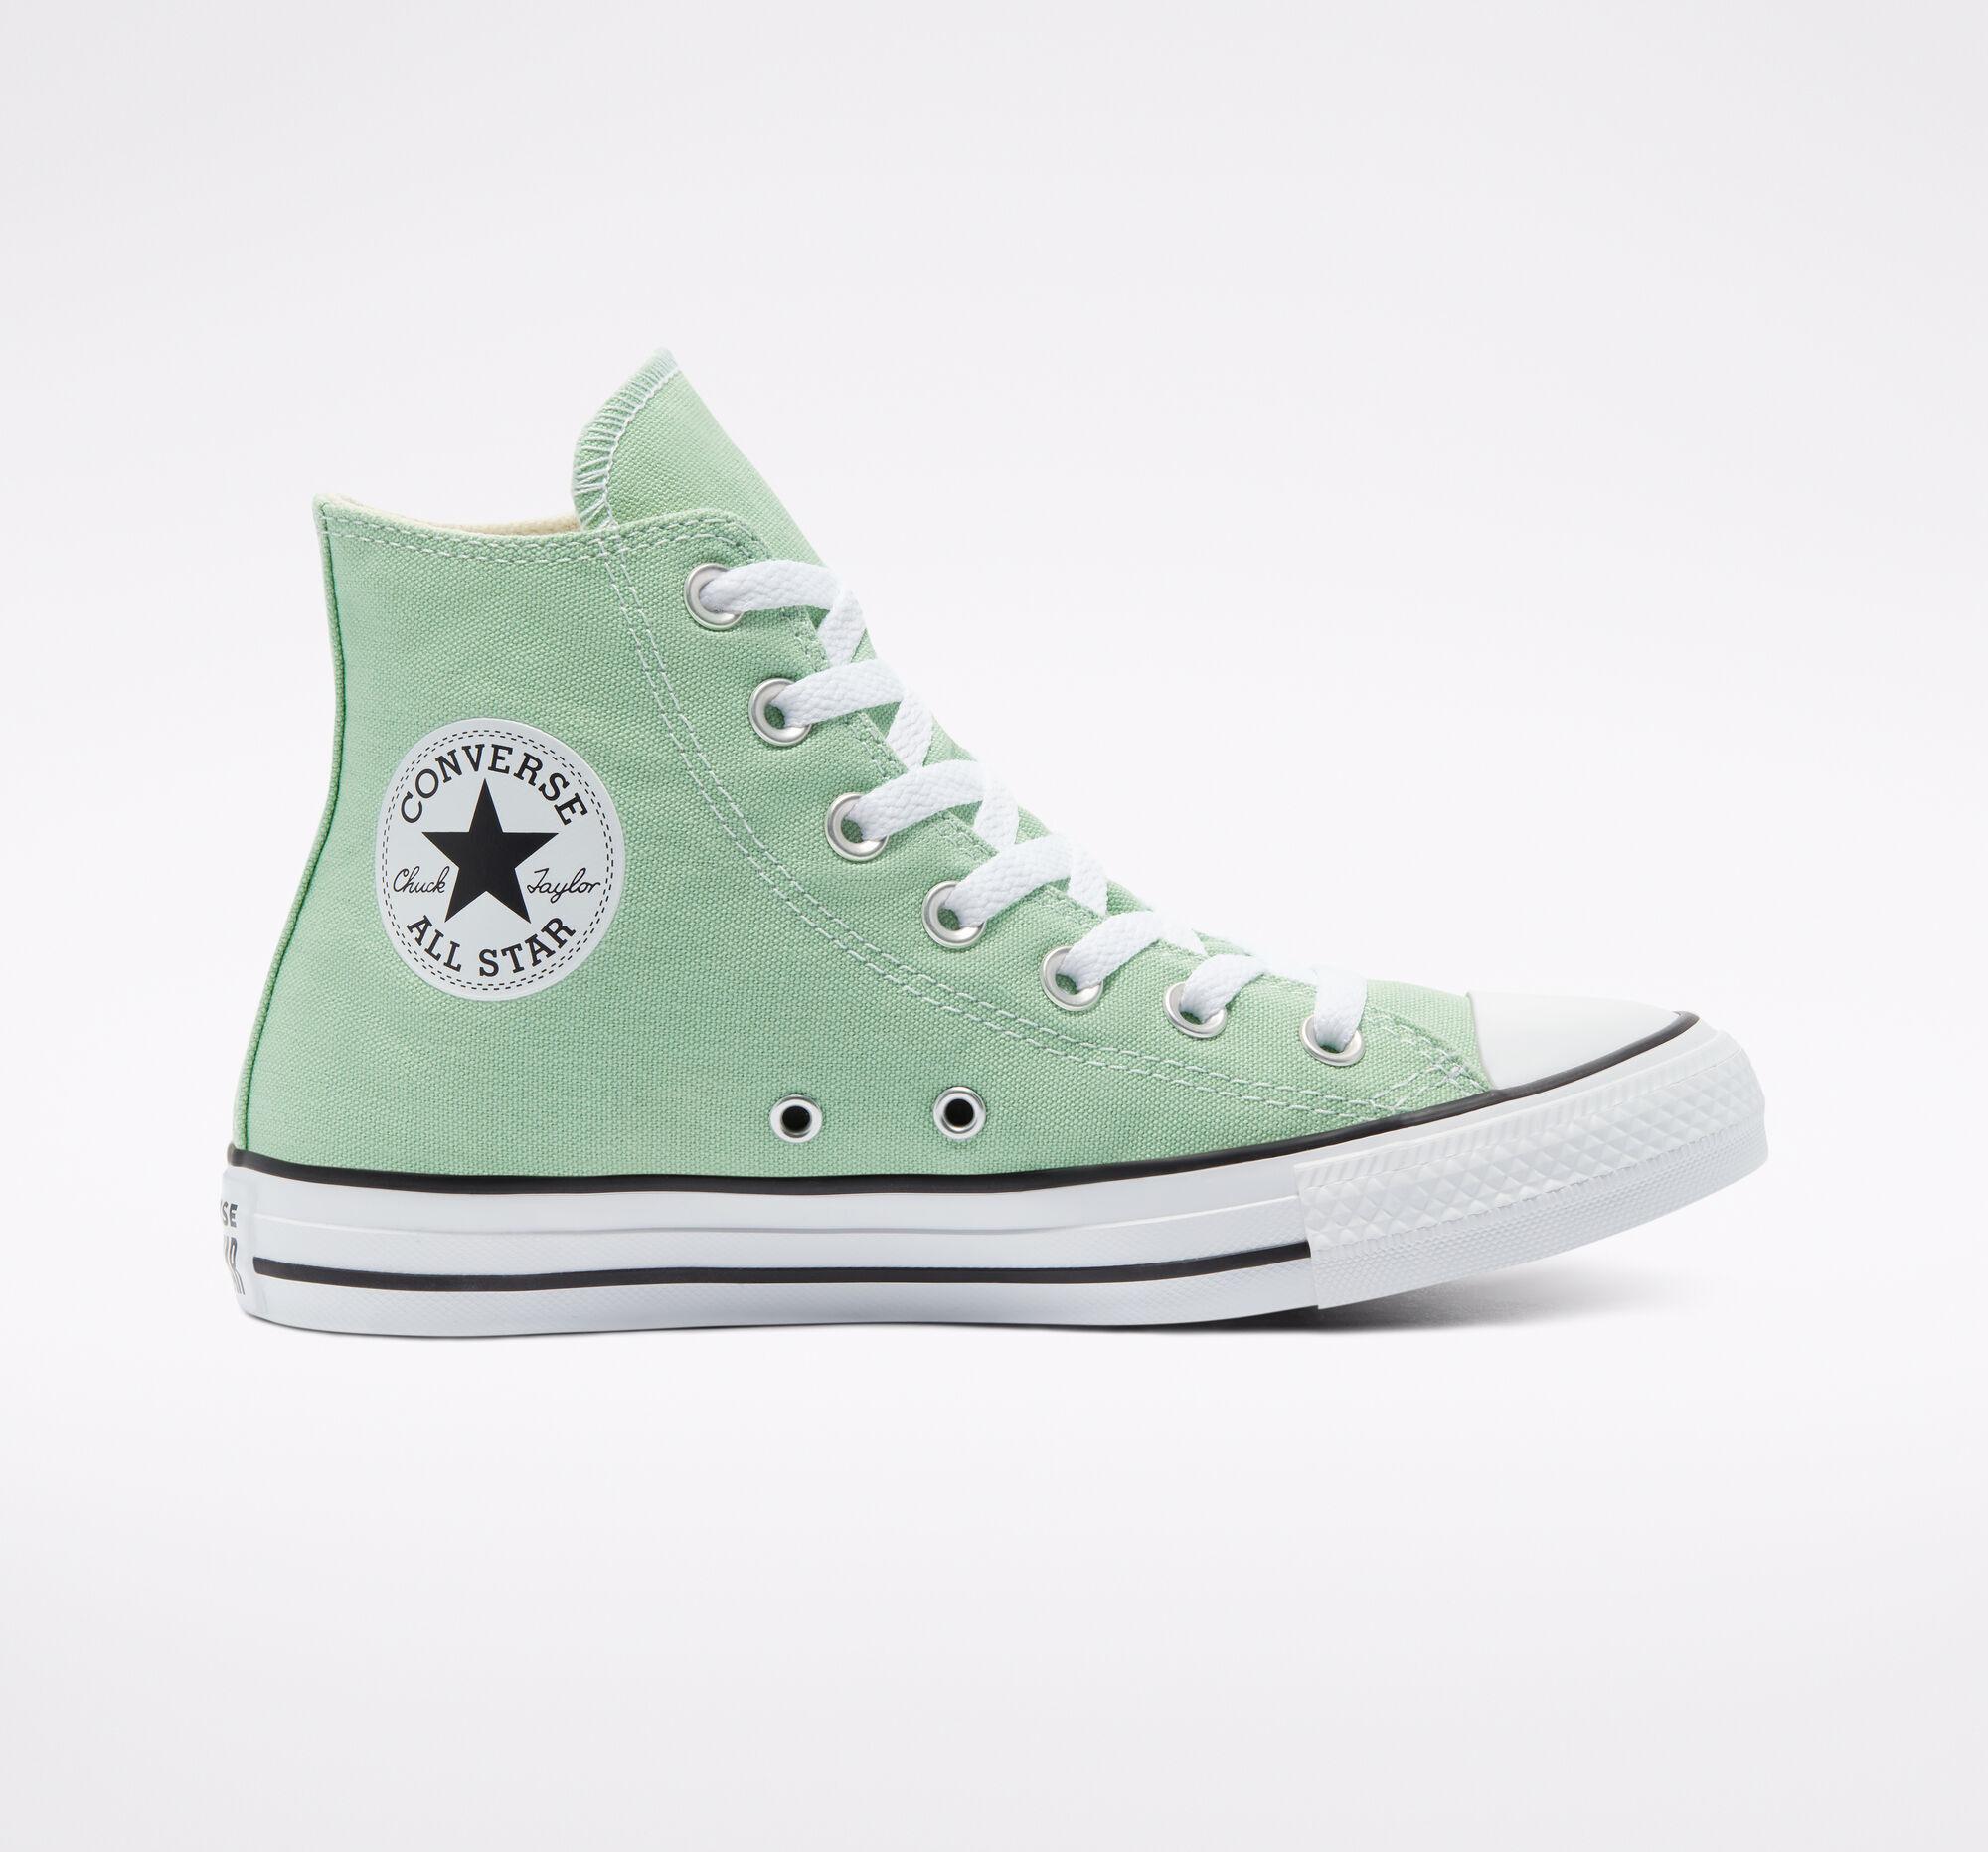 Zapatillas Chuck 70 en verde mint